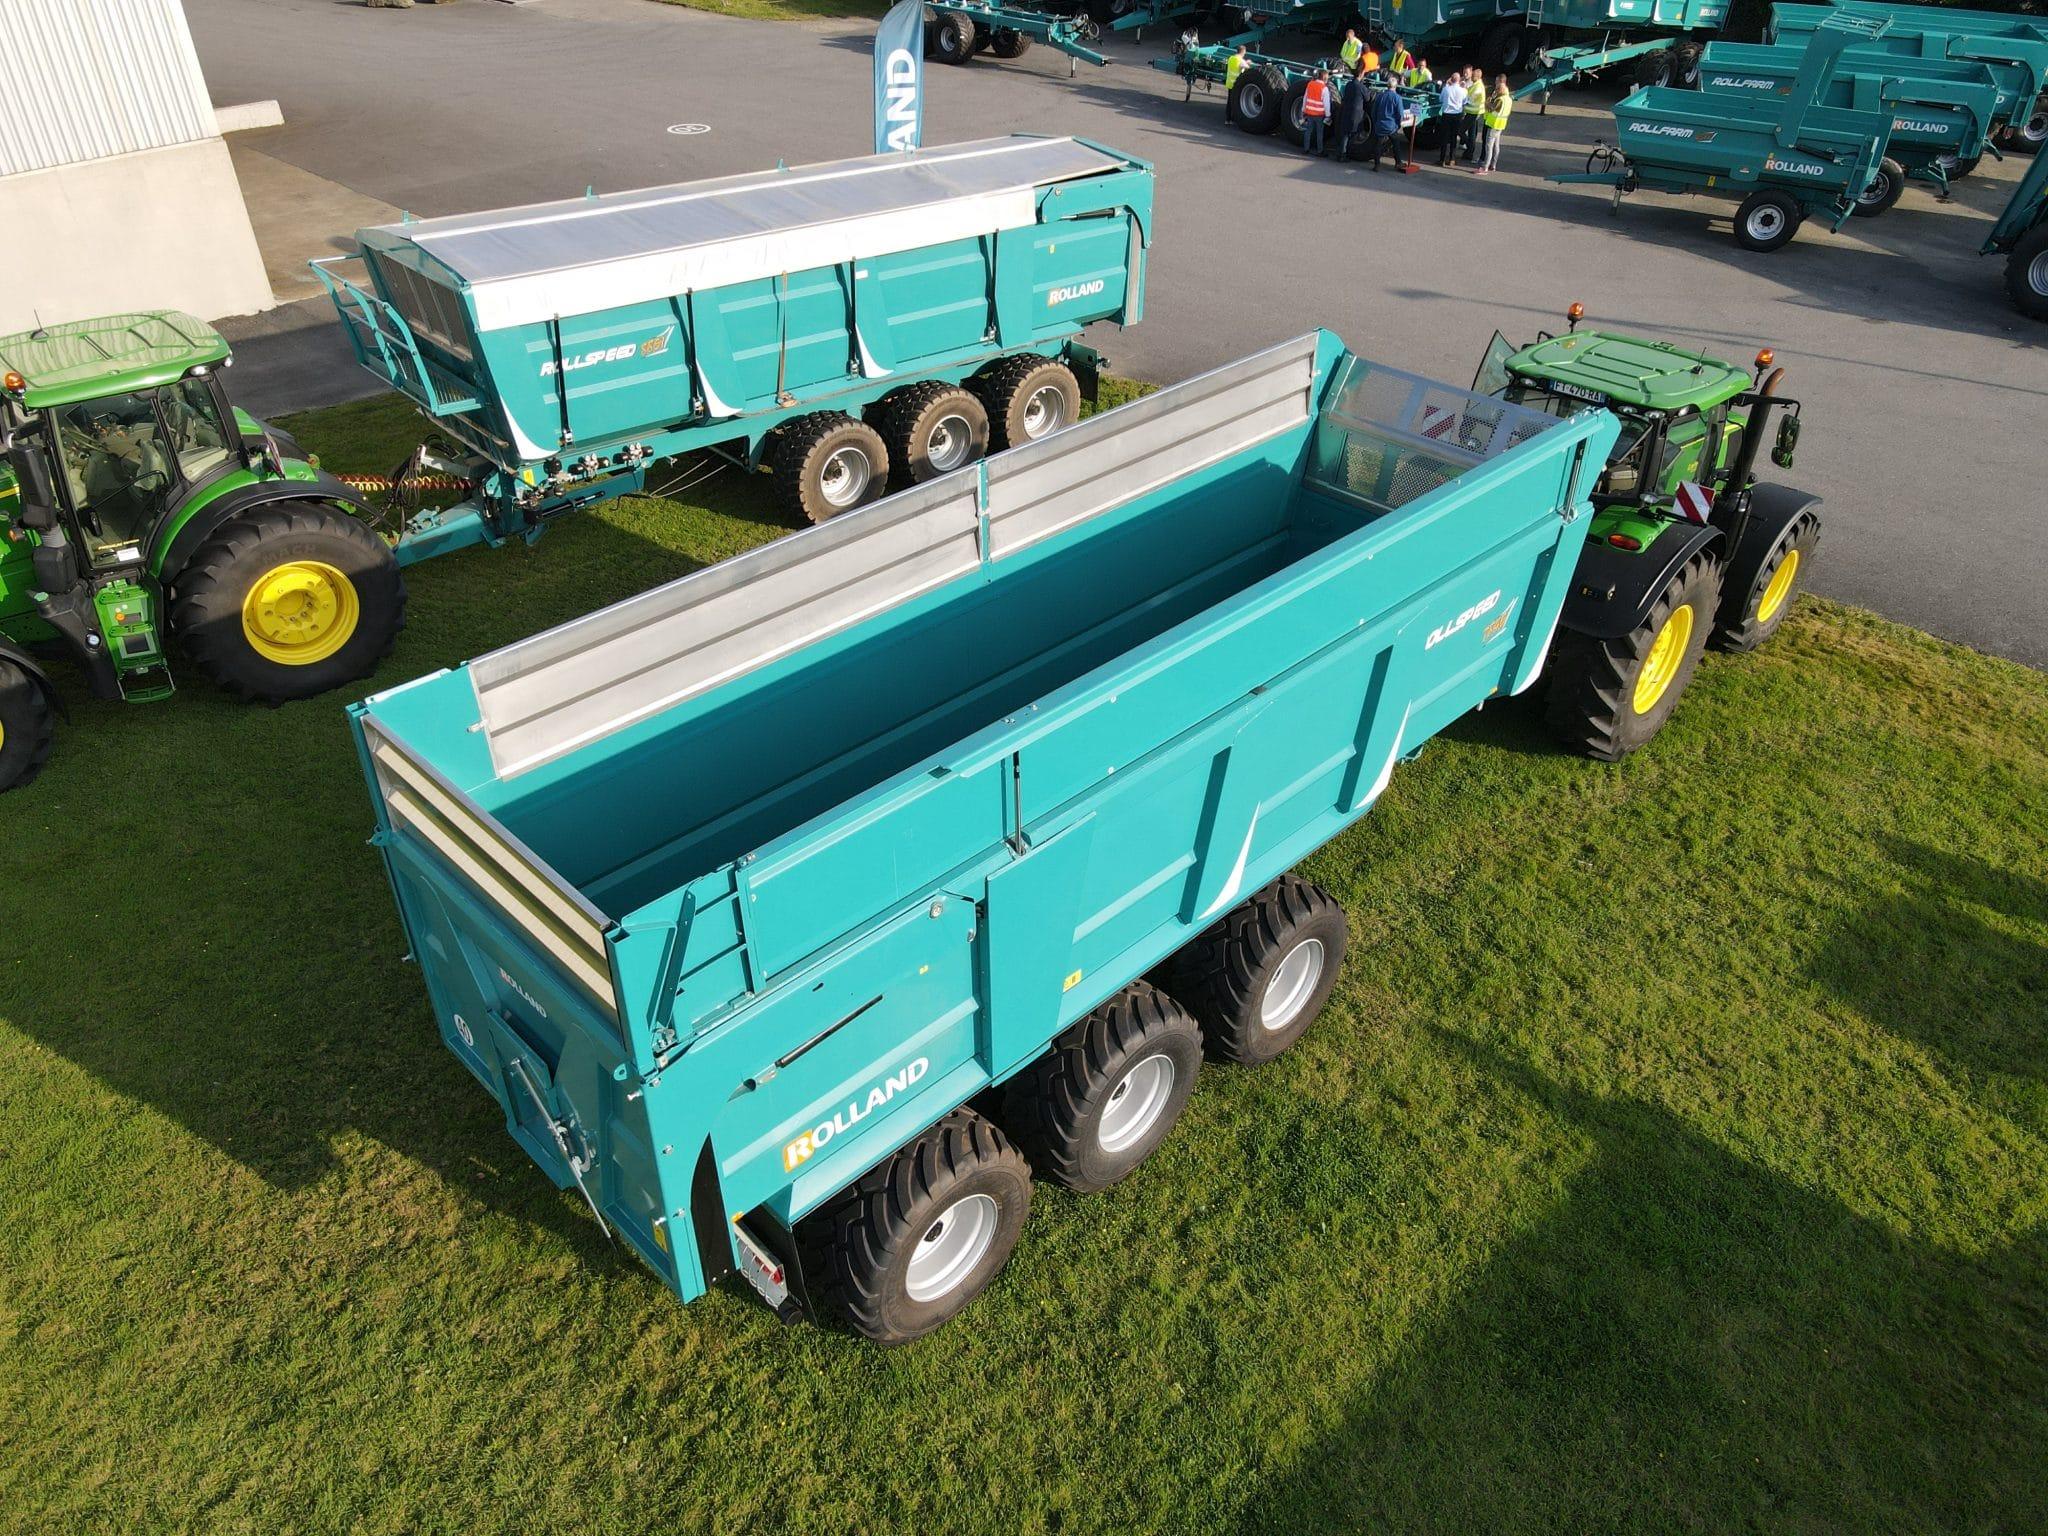 Nouveauté : Rollspeed 7840 rehausse hydraulique